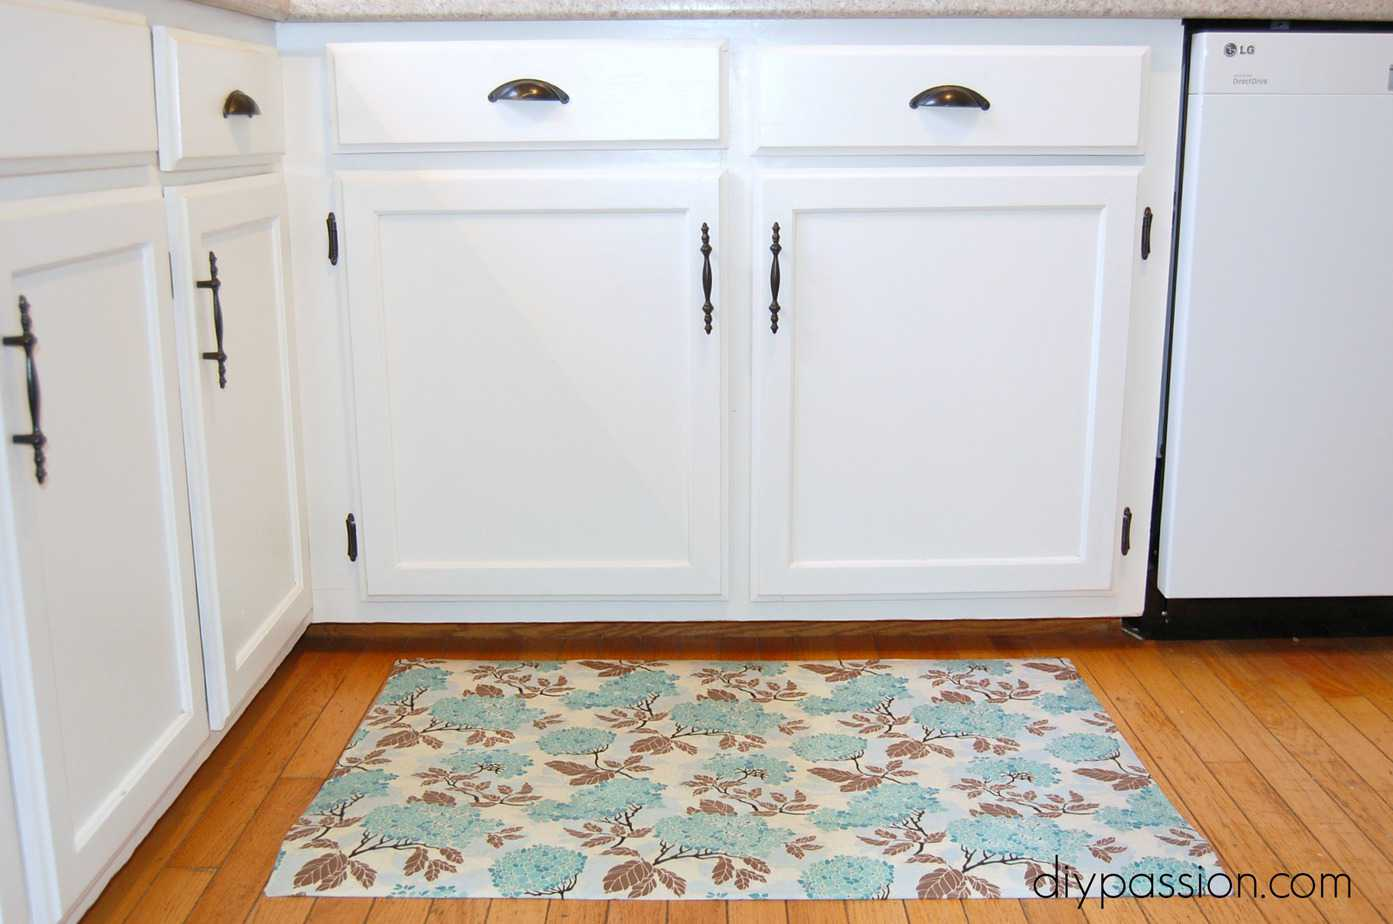 DIY Custom Kitchen Mat via diypassion.com